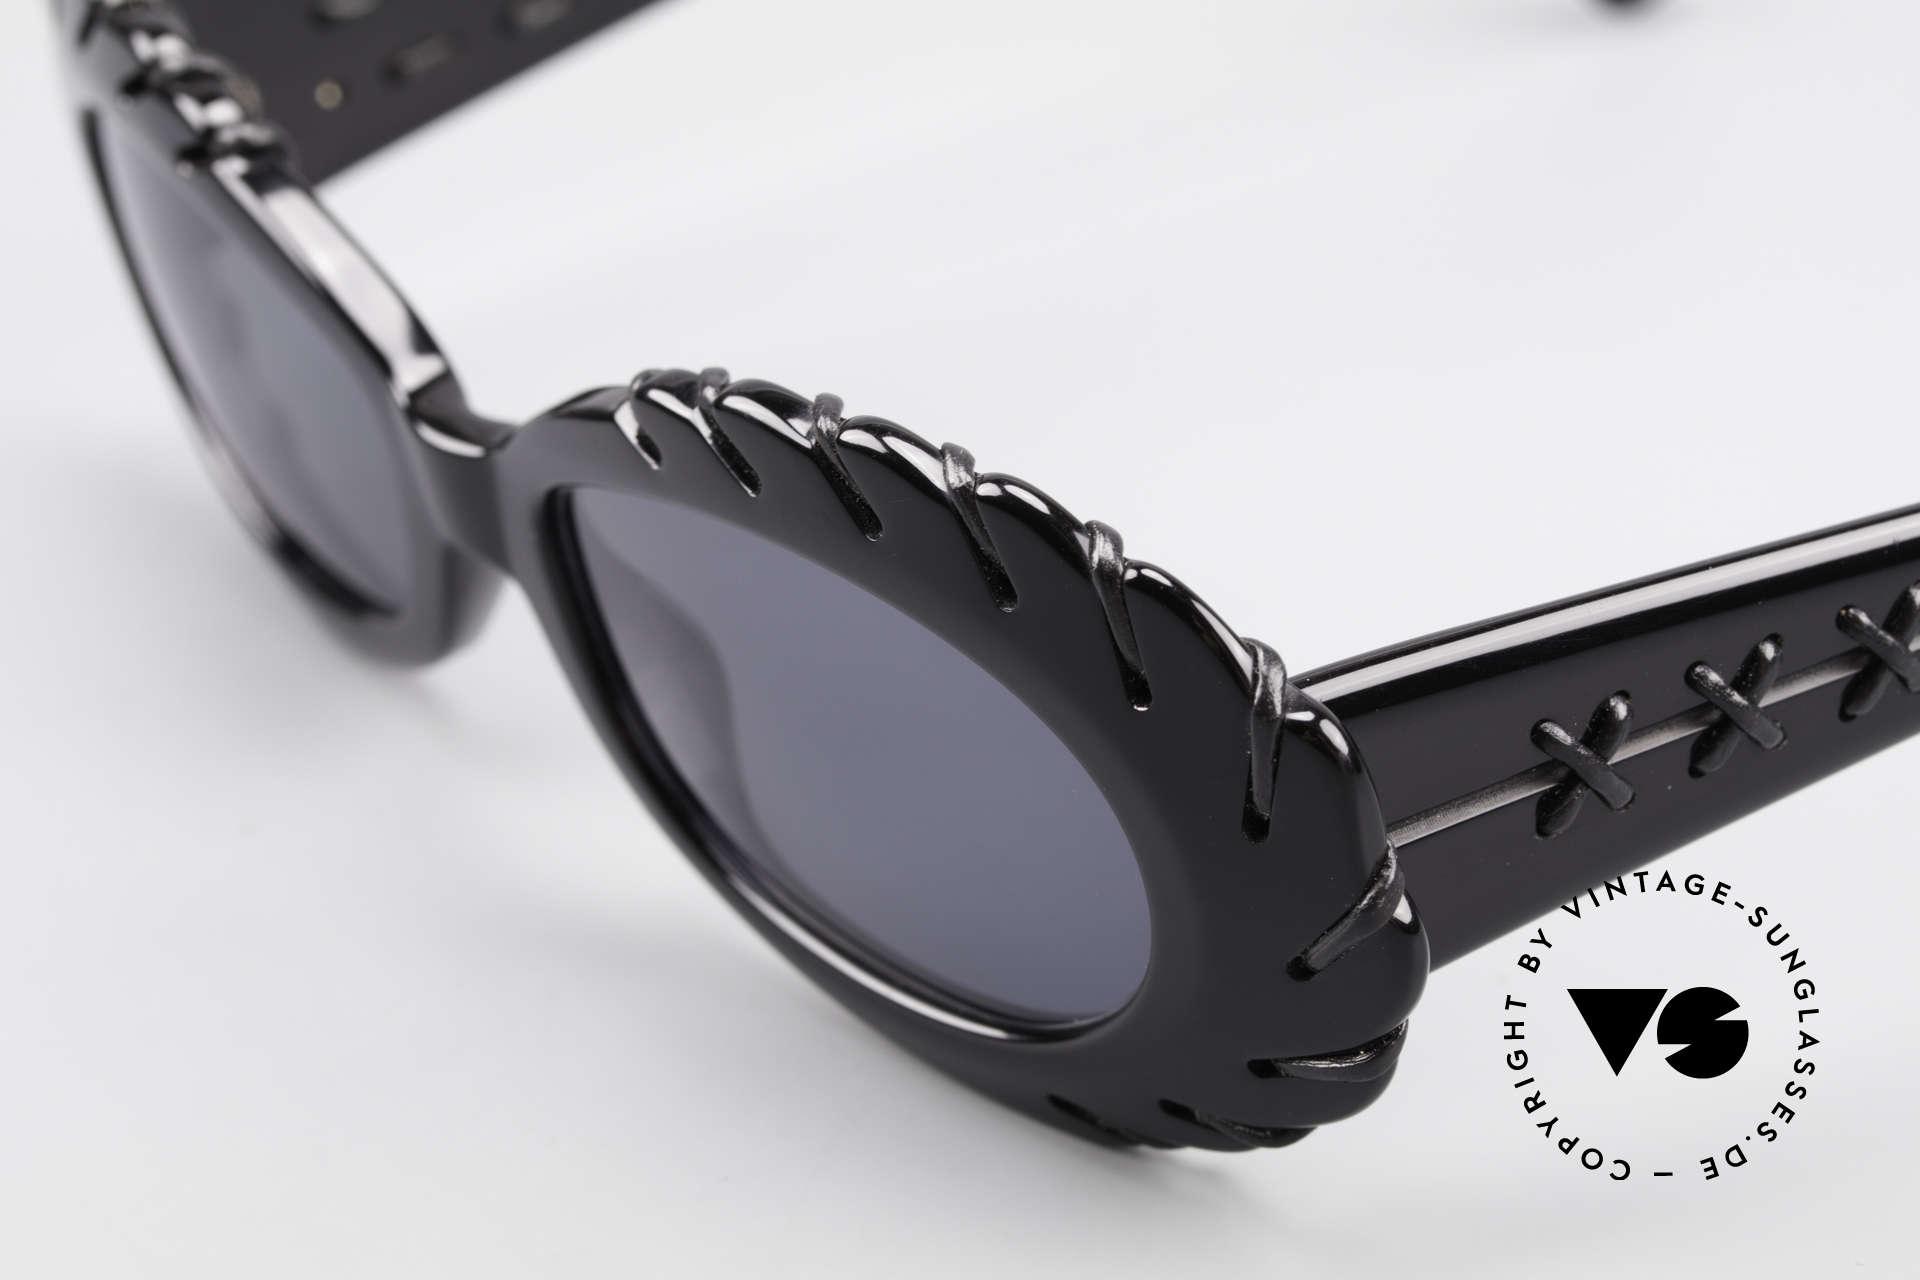 Claude Montana 705 1990's Design by Alain Mikli, many Montana glasses were designed by Alain Mikli,, Made for Women